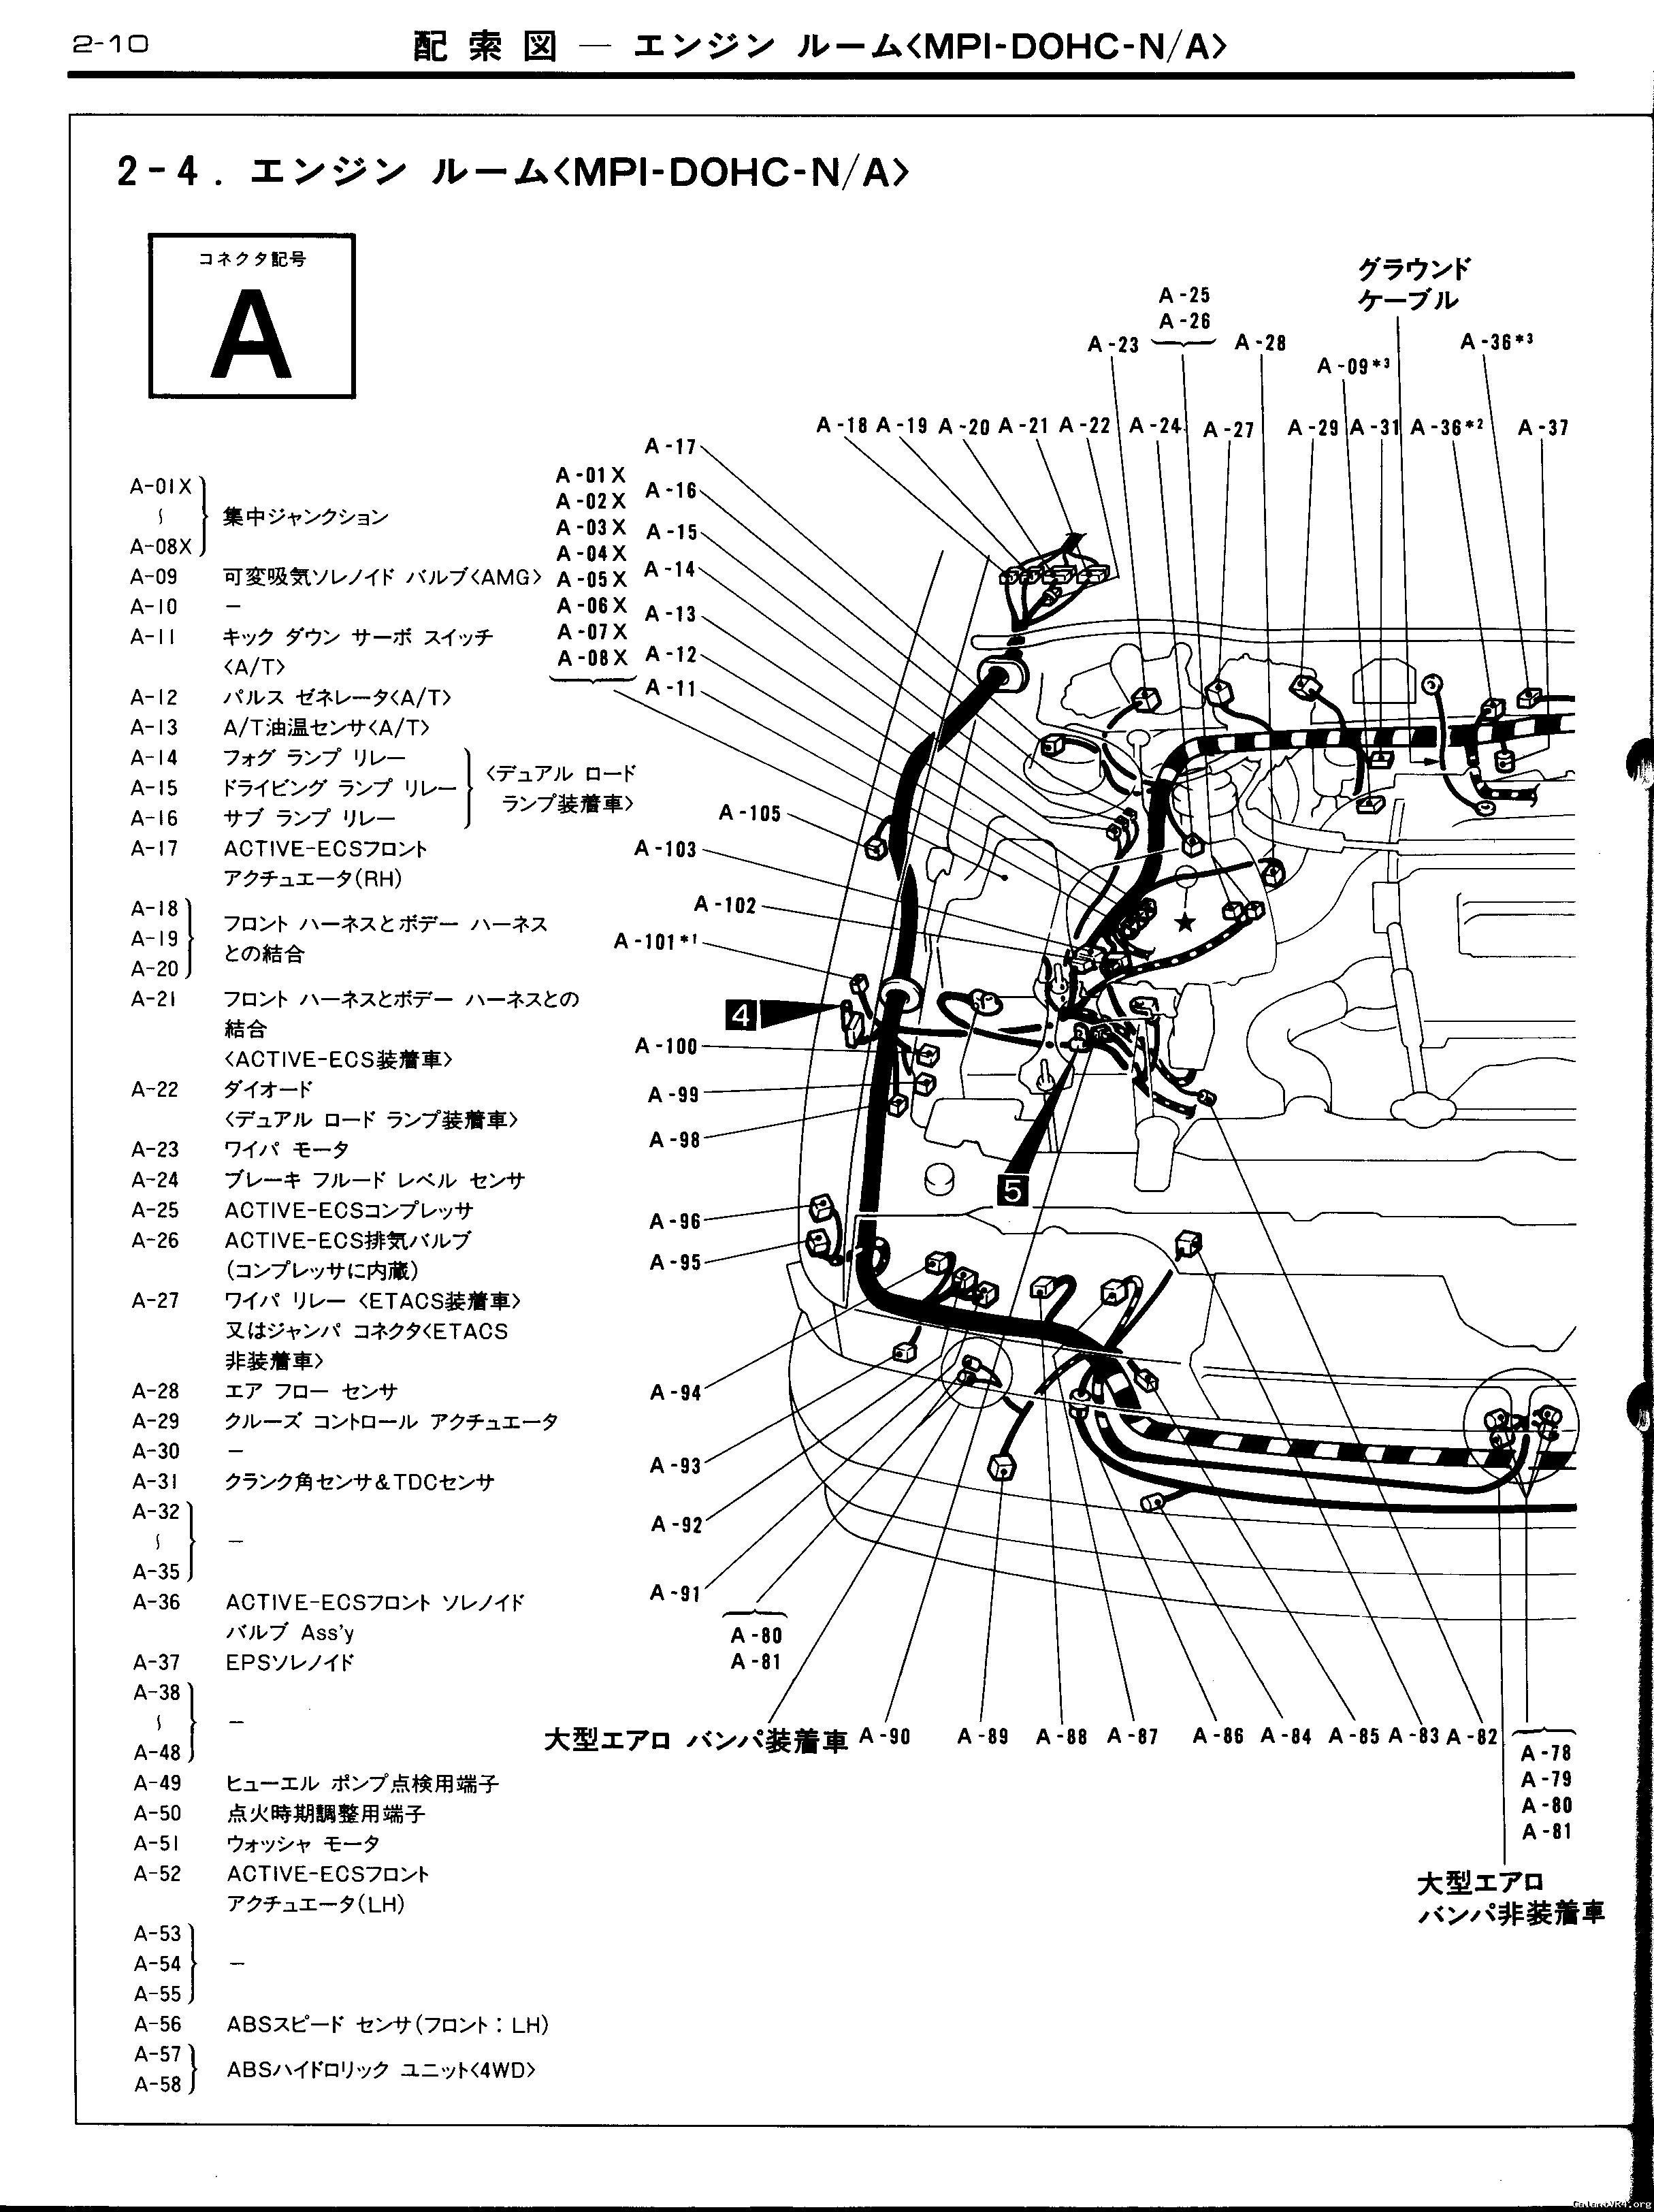 [DIAGRAM] 91 Dodge Stealth Wiring Diagram FULL Version HD ...